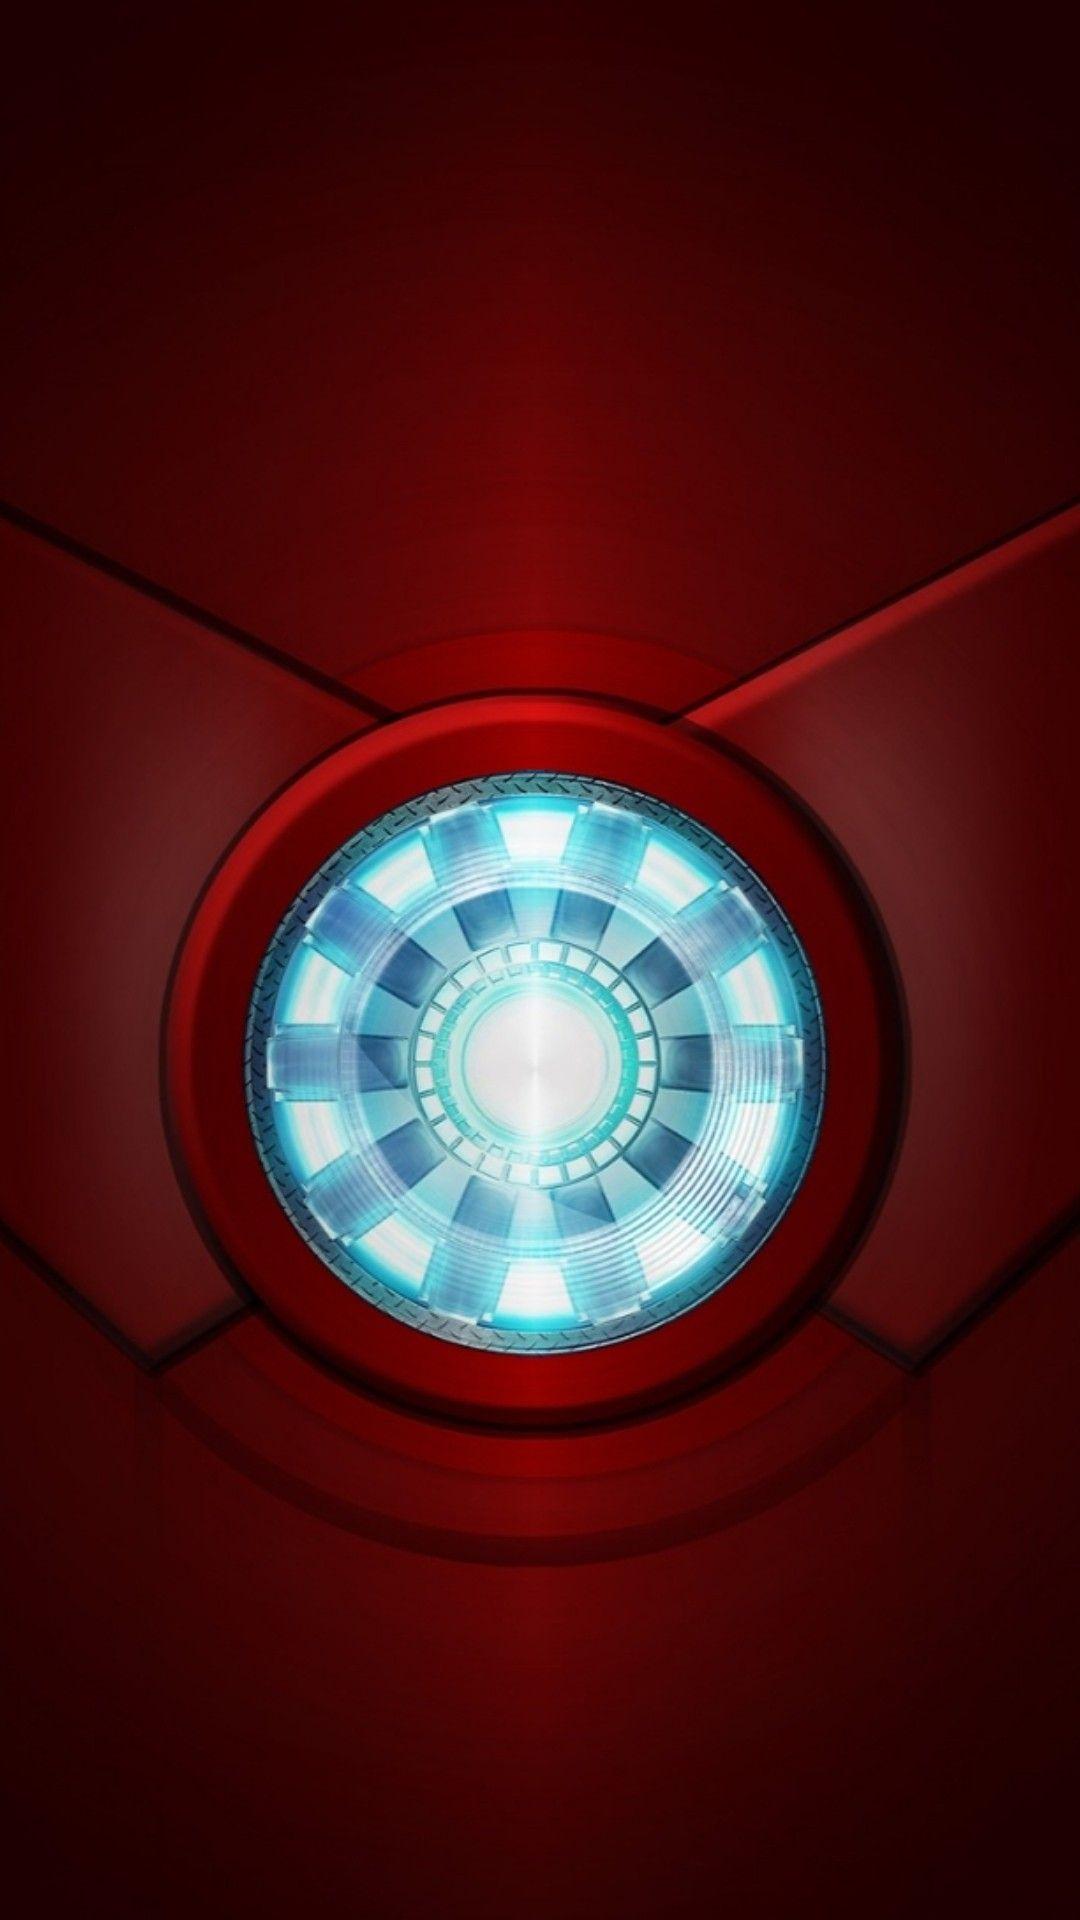 Iron man jrs calli wp - Fondos de pantalla de iron man en 3d ...